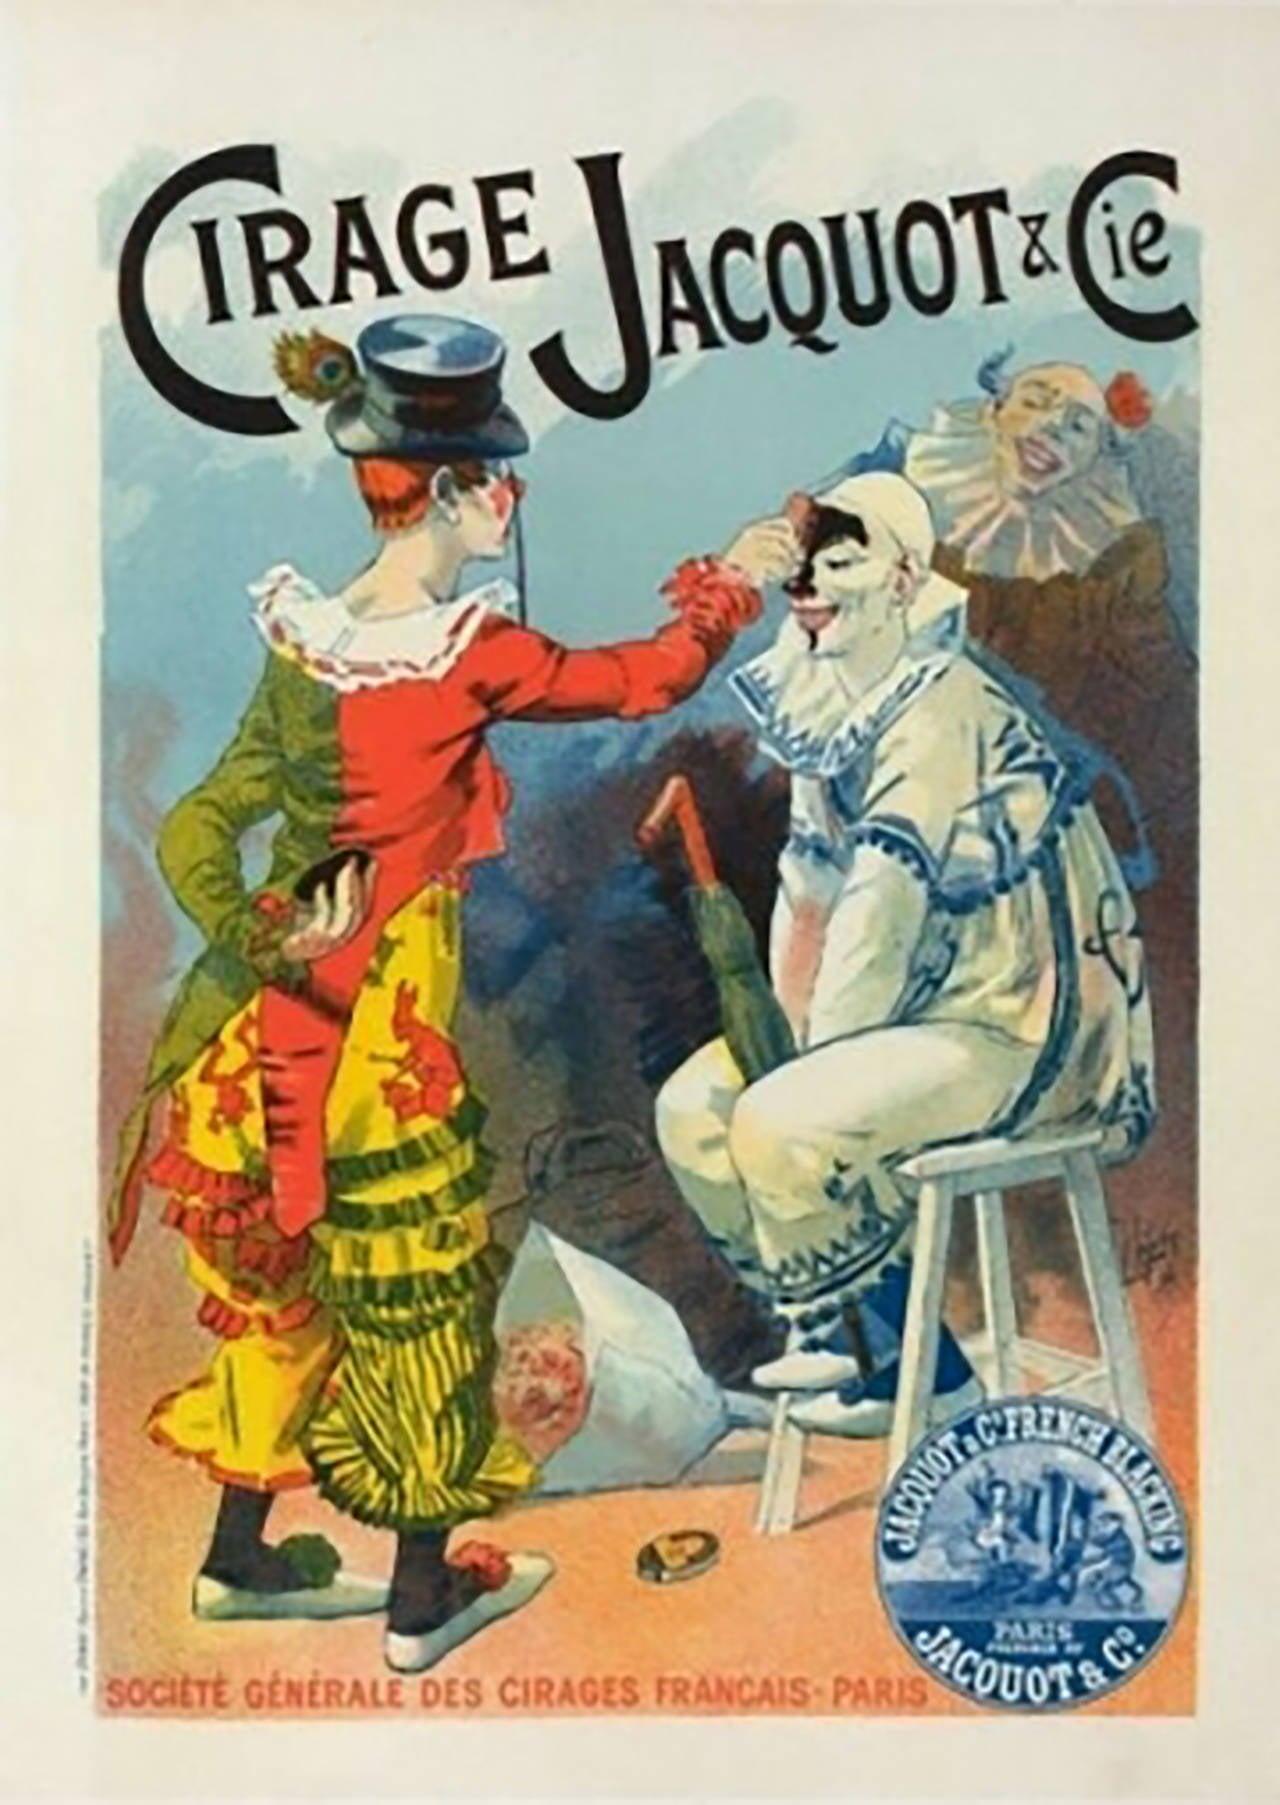 Cirage Jacquot & Co.